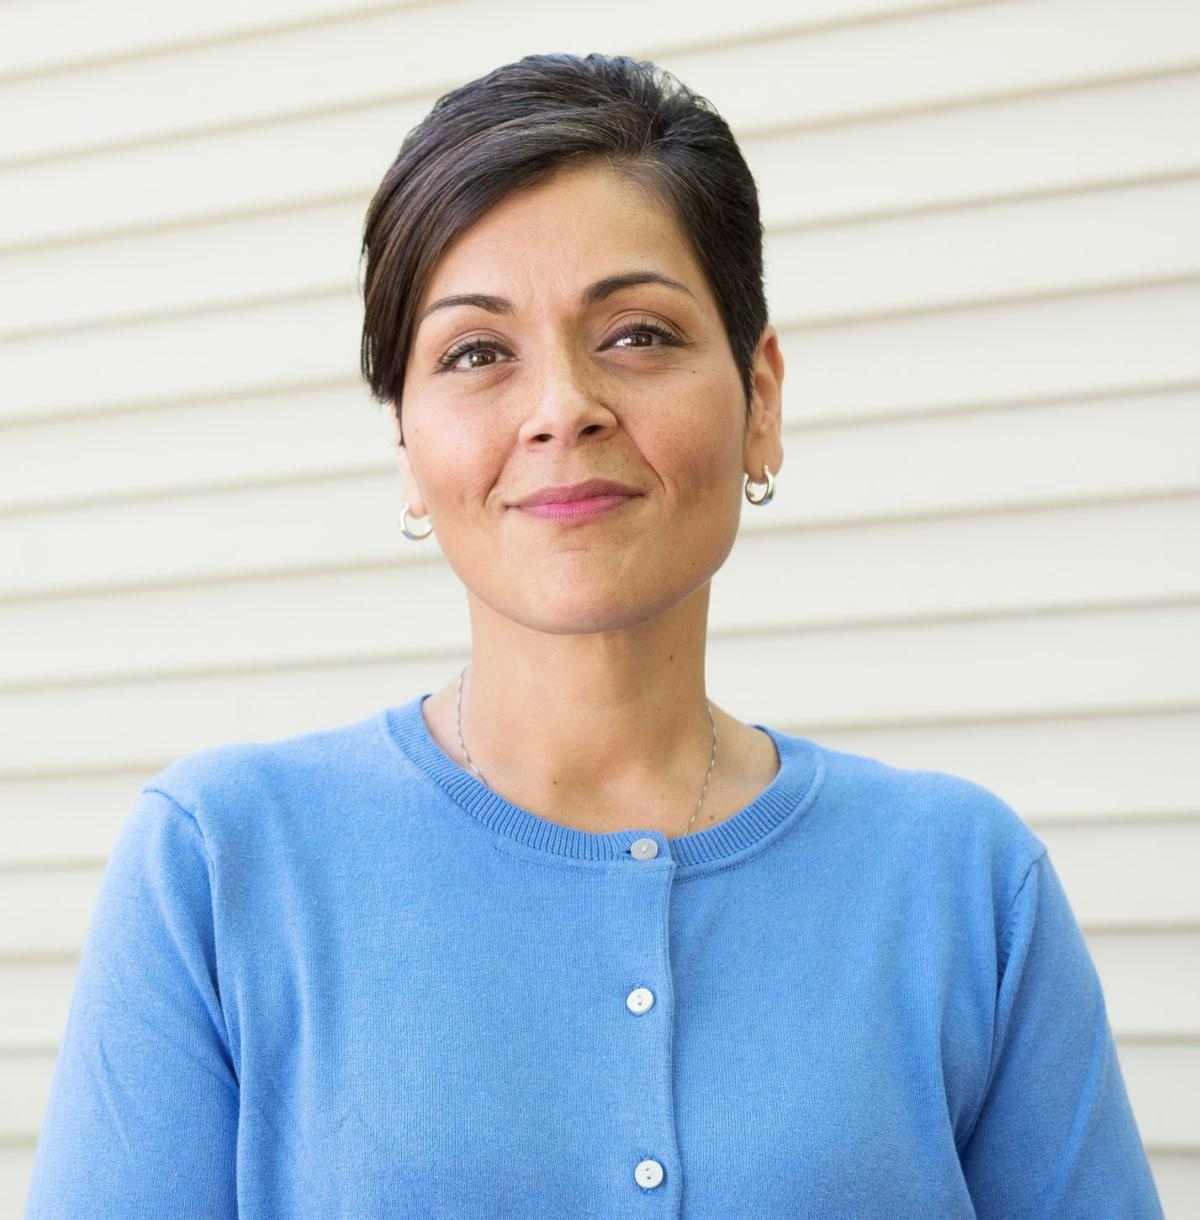 Northern Virginia delegate Hala Ayala announces bid for lieutenant governor    State and Regional News   fredericksburg.com